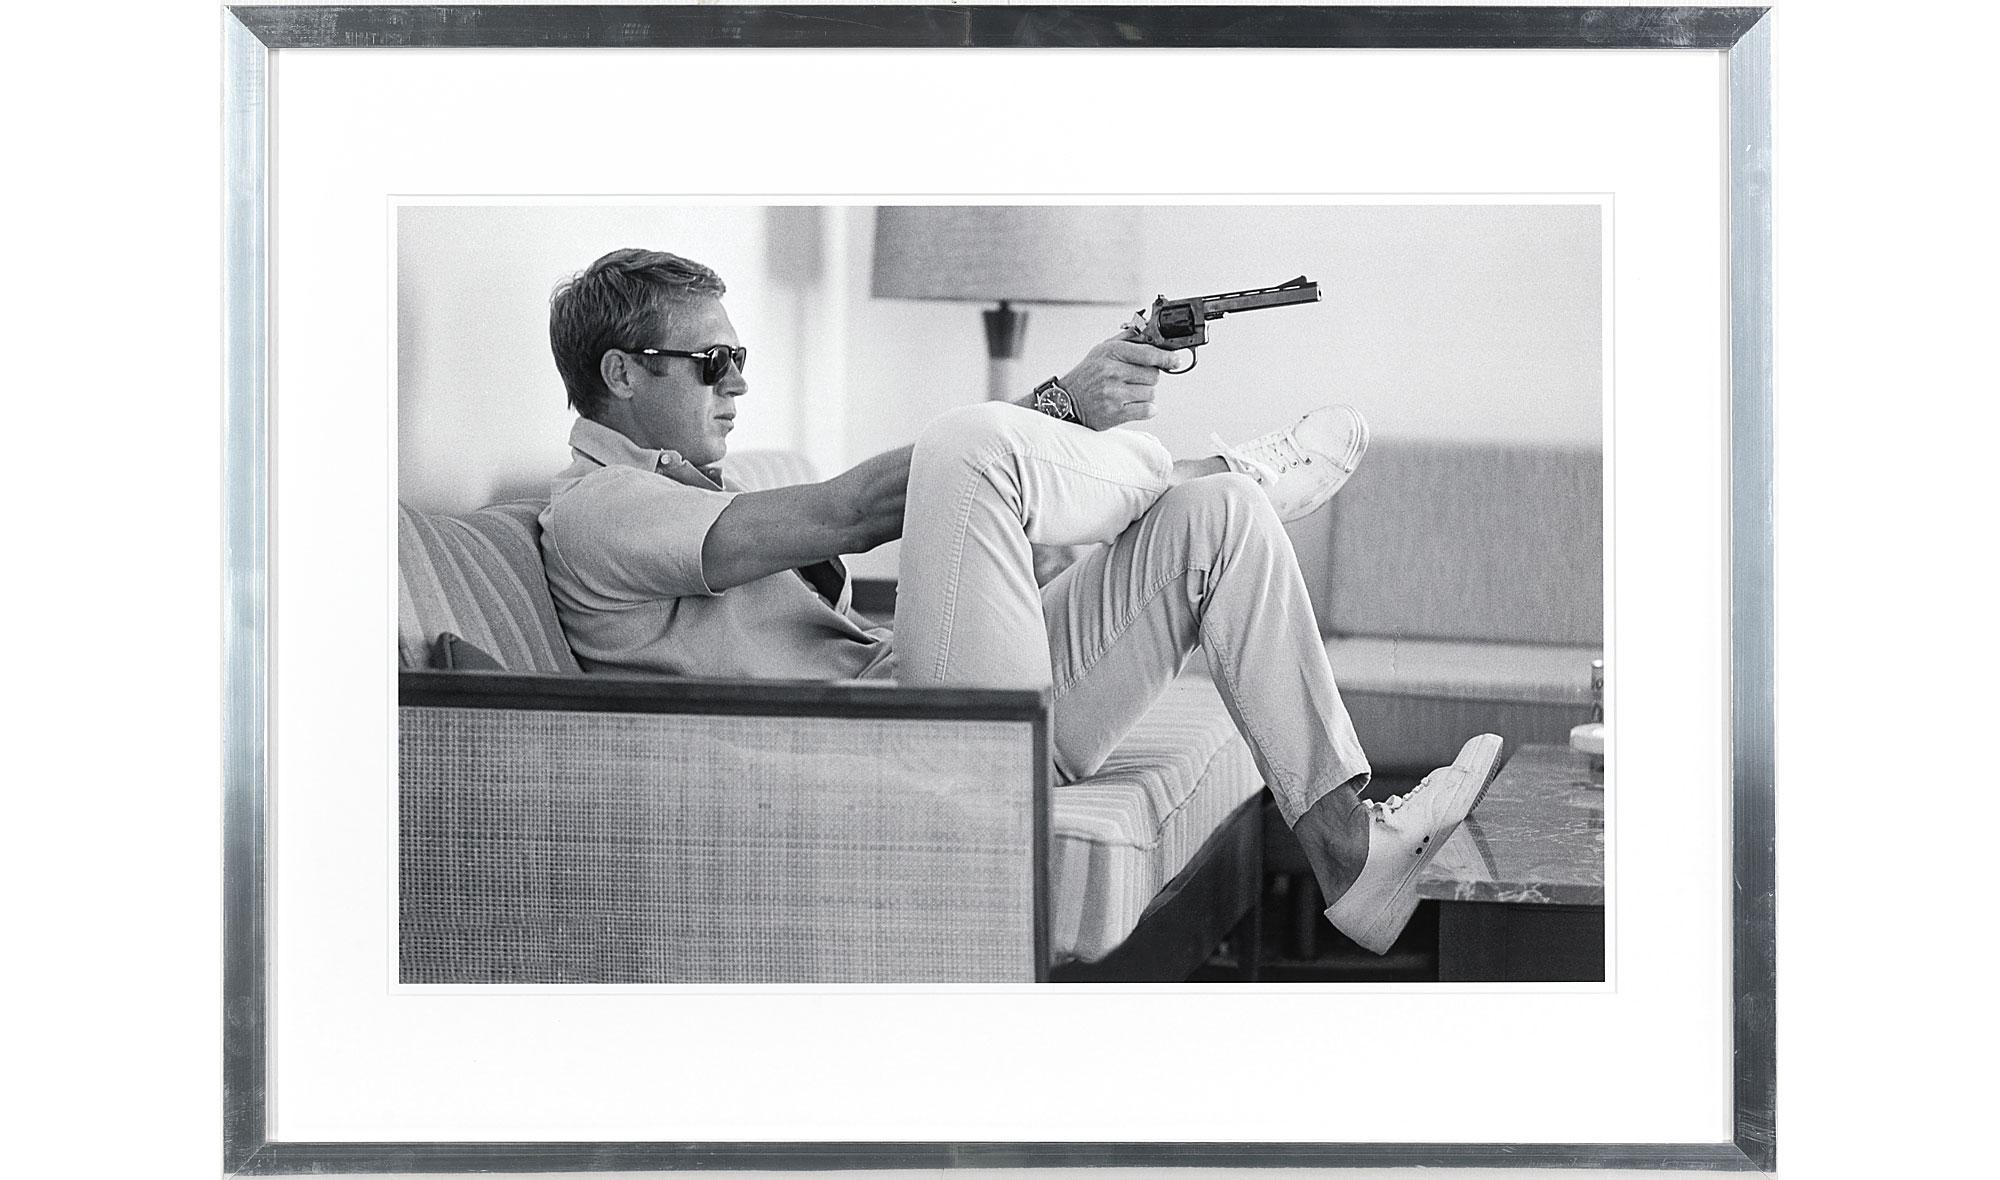 Cuadro Steve McQueen apuntando marco en aluminio en Portobellostreet.es